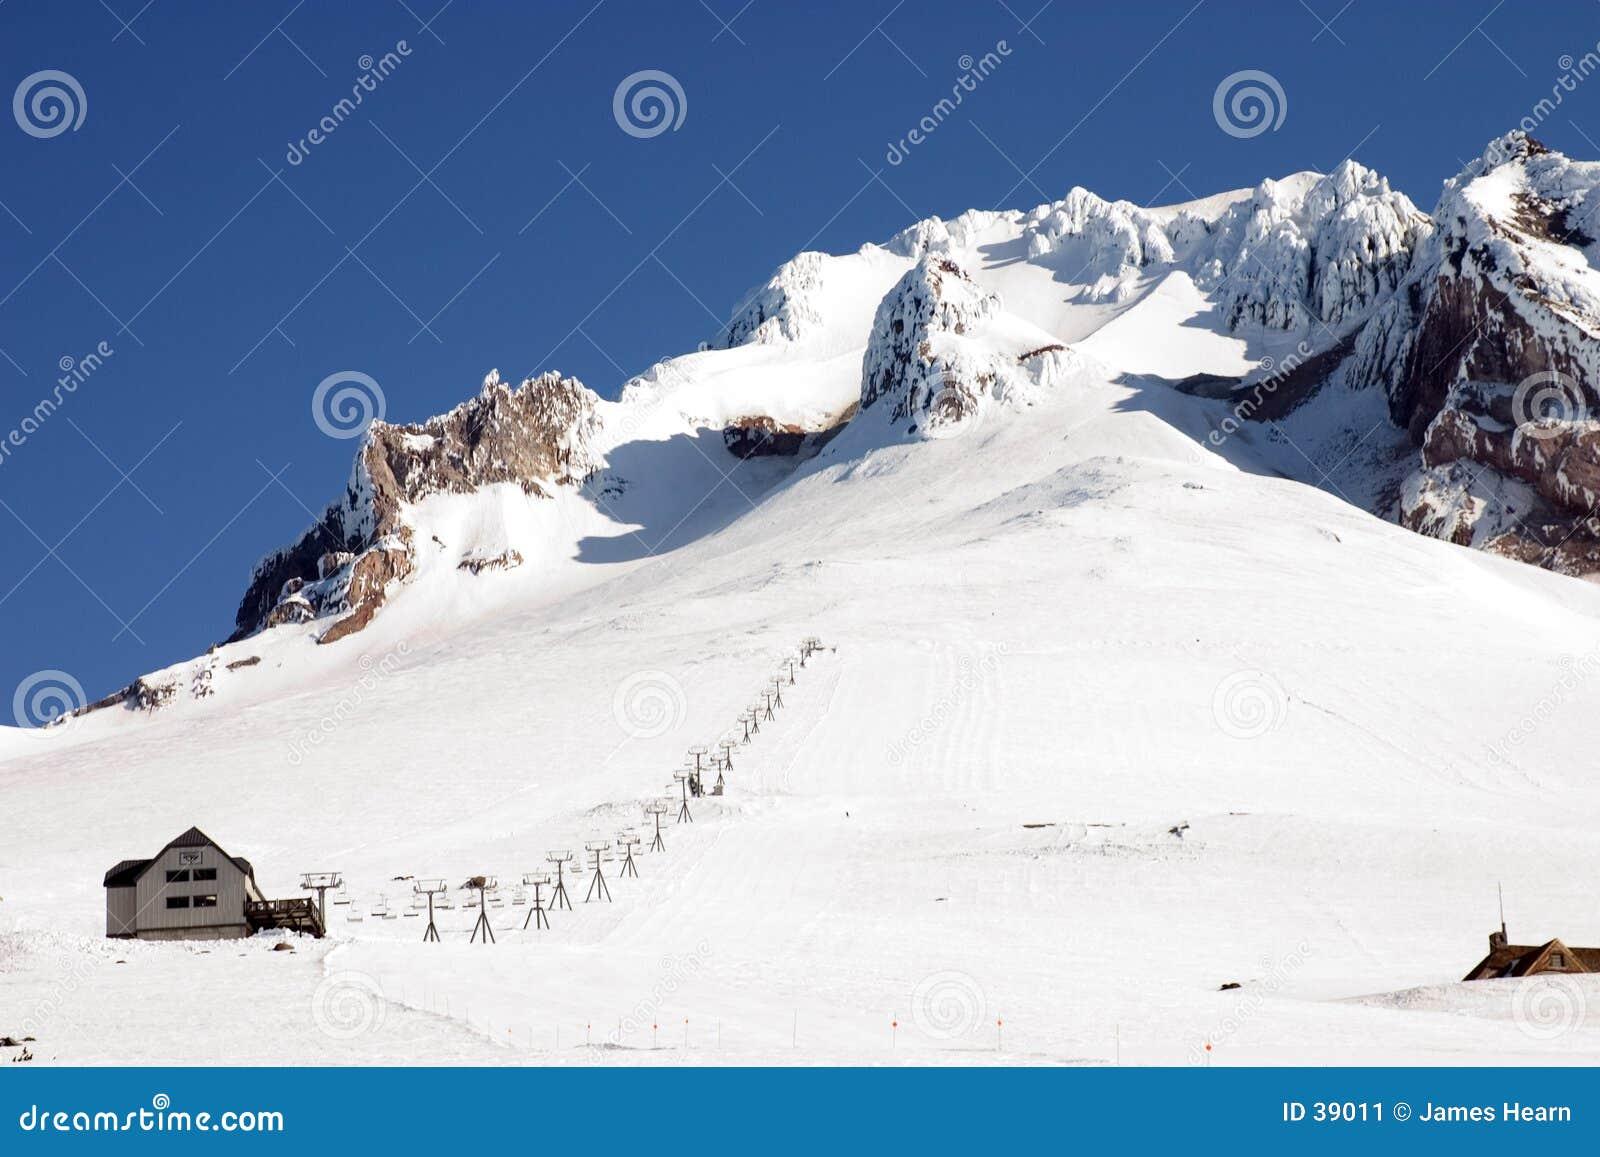 Ski lift on Mount Hood.